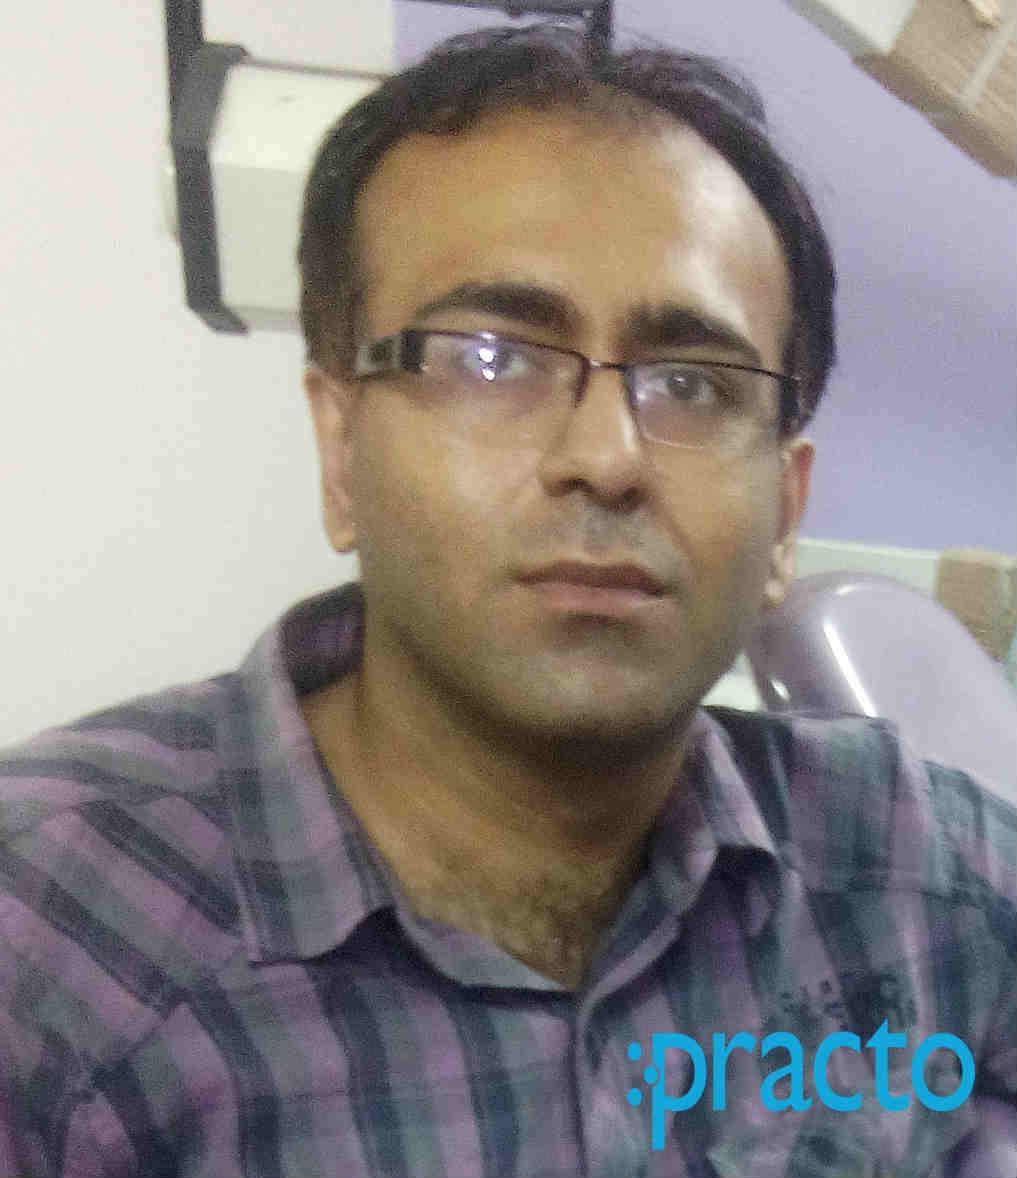 dr mendiratta s dental clinic dentistry clinic in lajpat nagar dr mendiratta s dental clinic dentistry clinic in lajpat nagar delhi book appointment view fees feedbacks practo